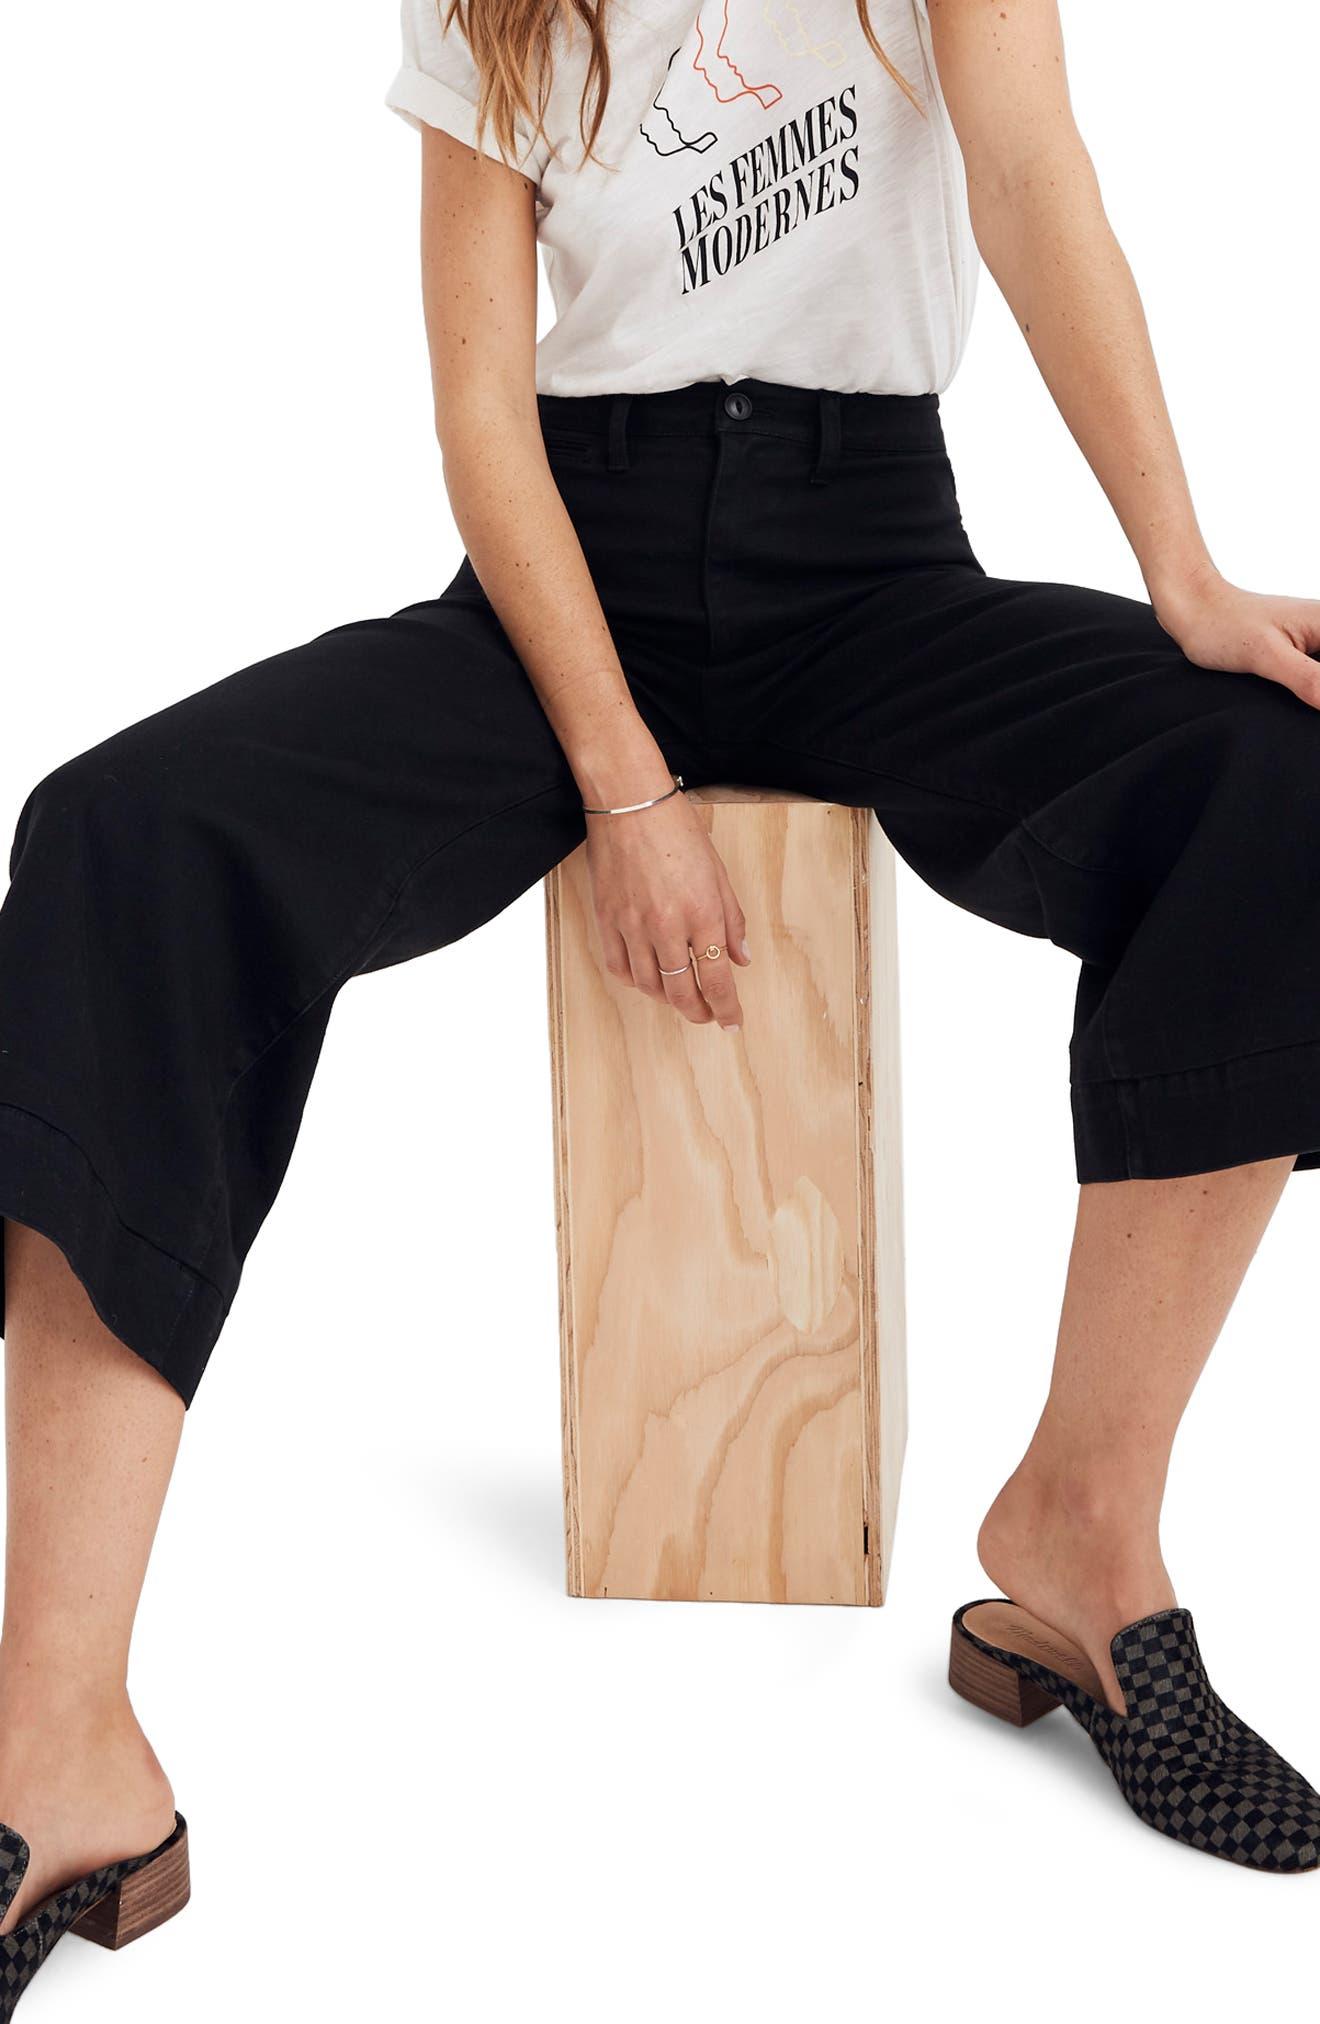 MADEWELL, Emmett Crop Wide Leg Pants, Main thumbnail 1, color, CLASSIC BLACK